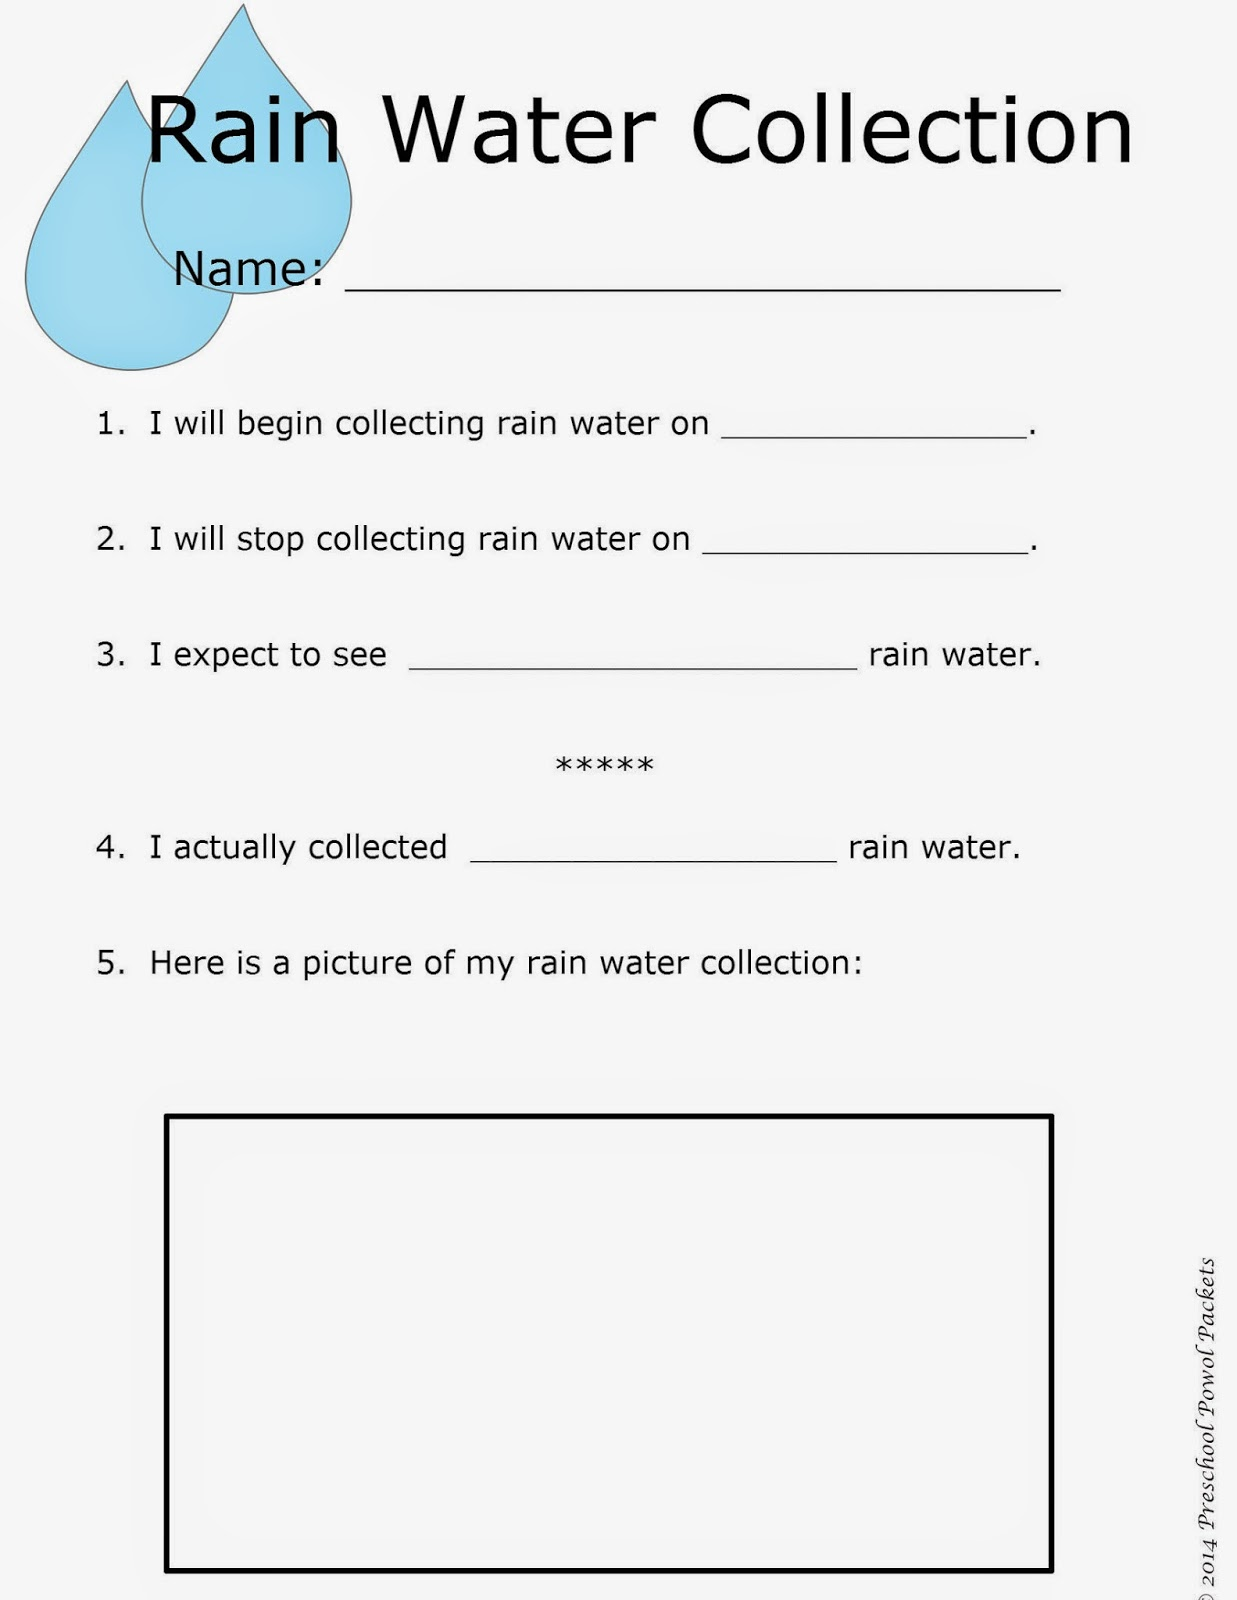 Rain Water Collection Preschool Earth Day Science